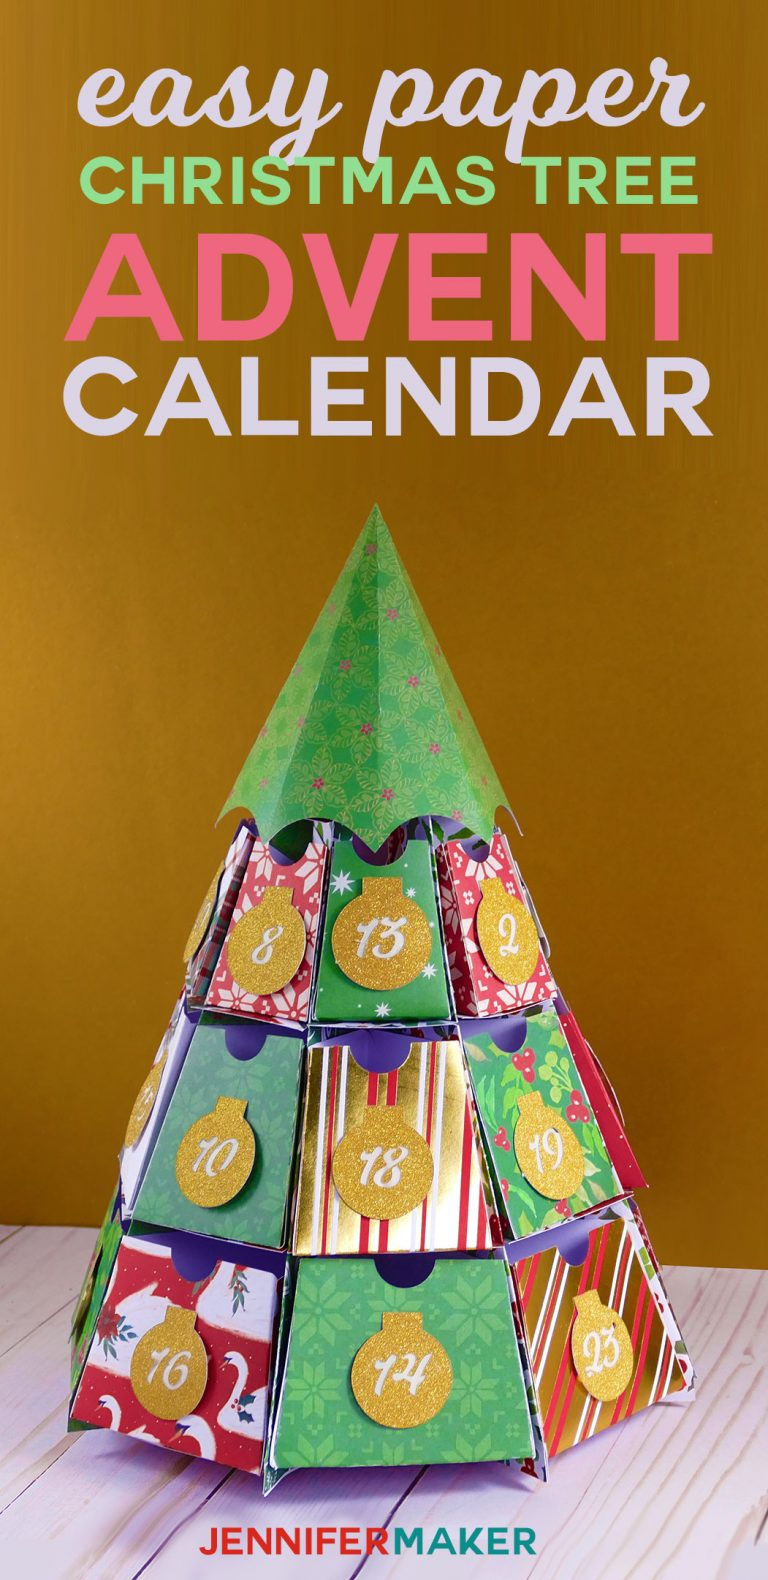 Christmas Tree Advent Calendar: 25 Days of Maker Projects! - Jennifer Maker